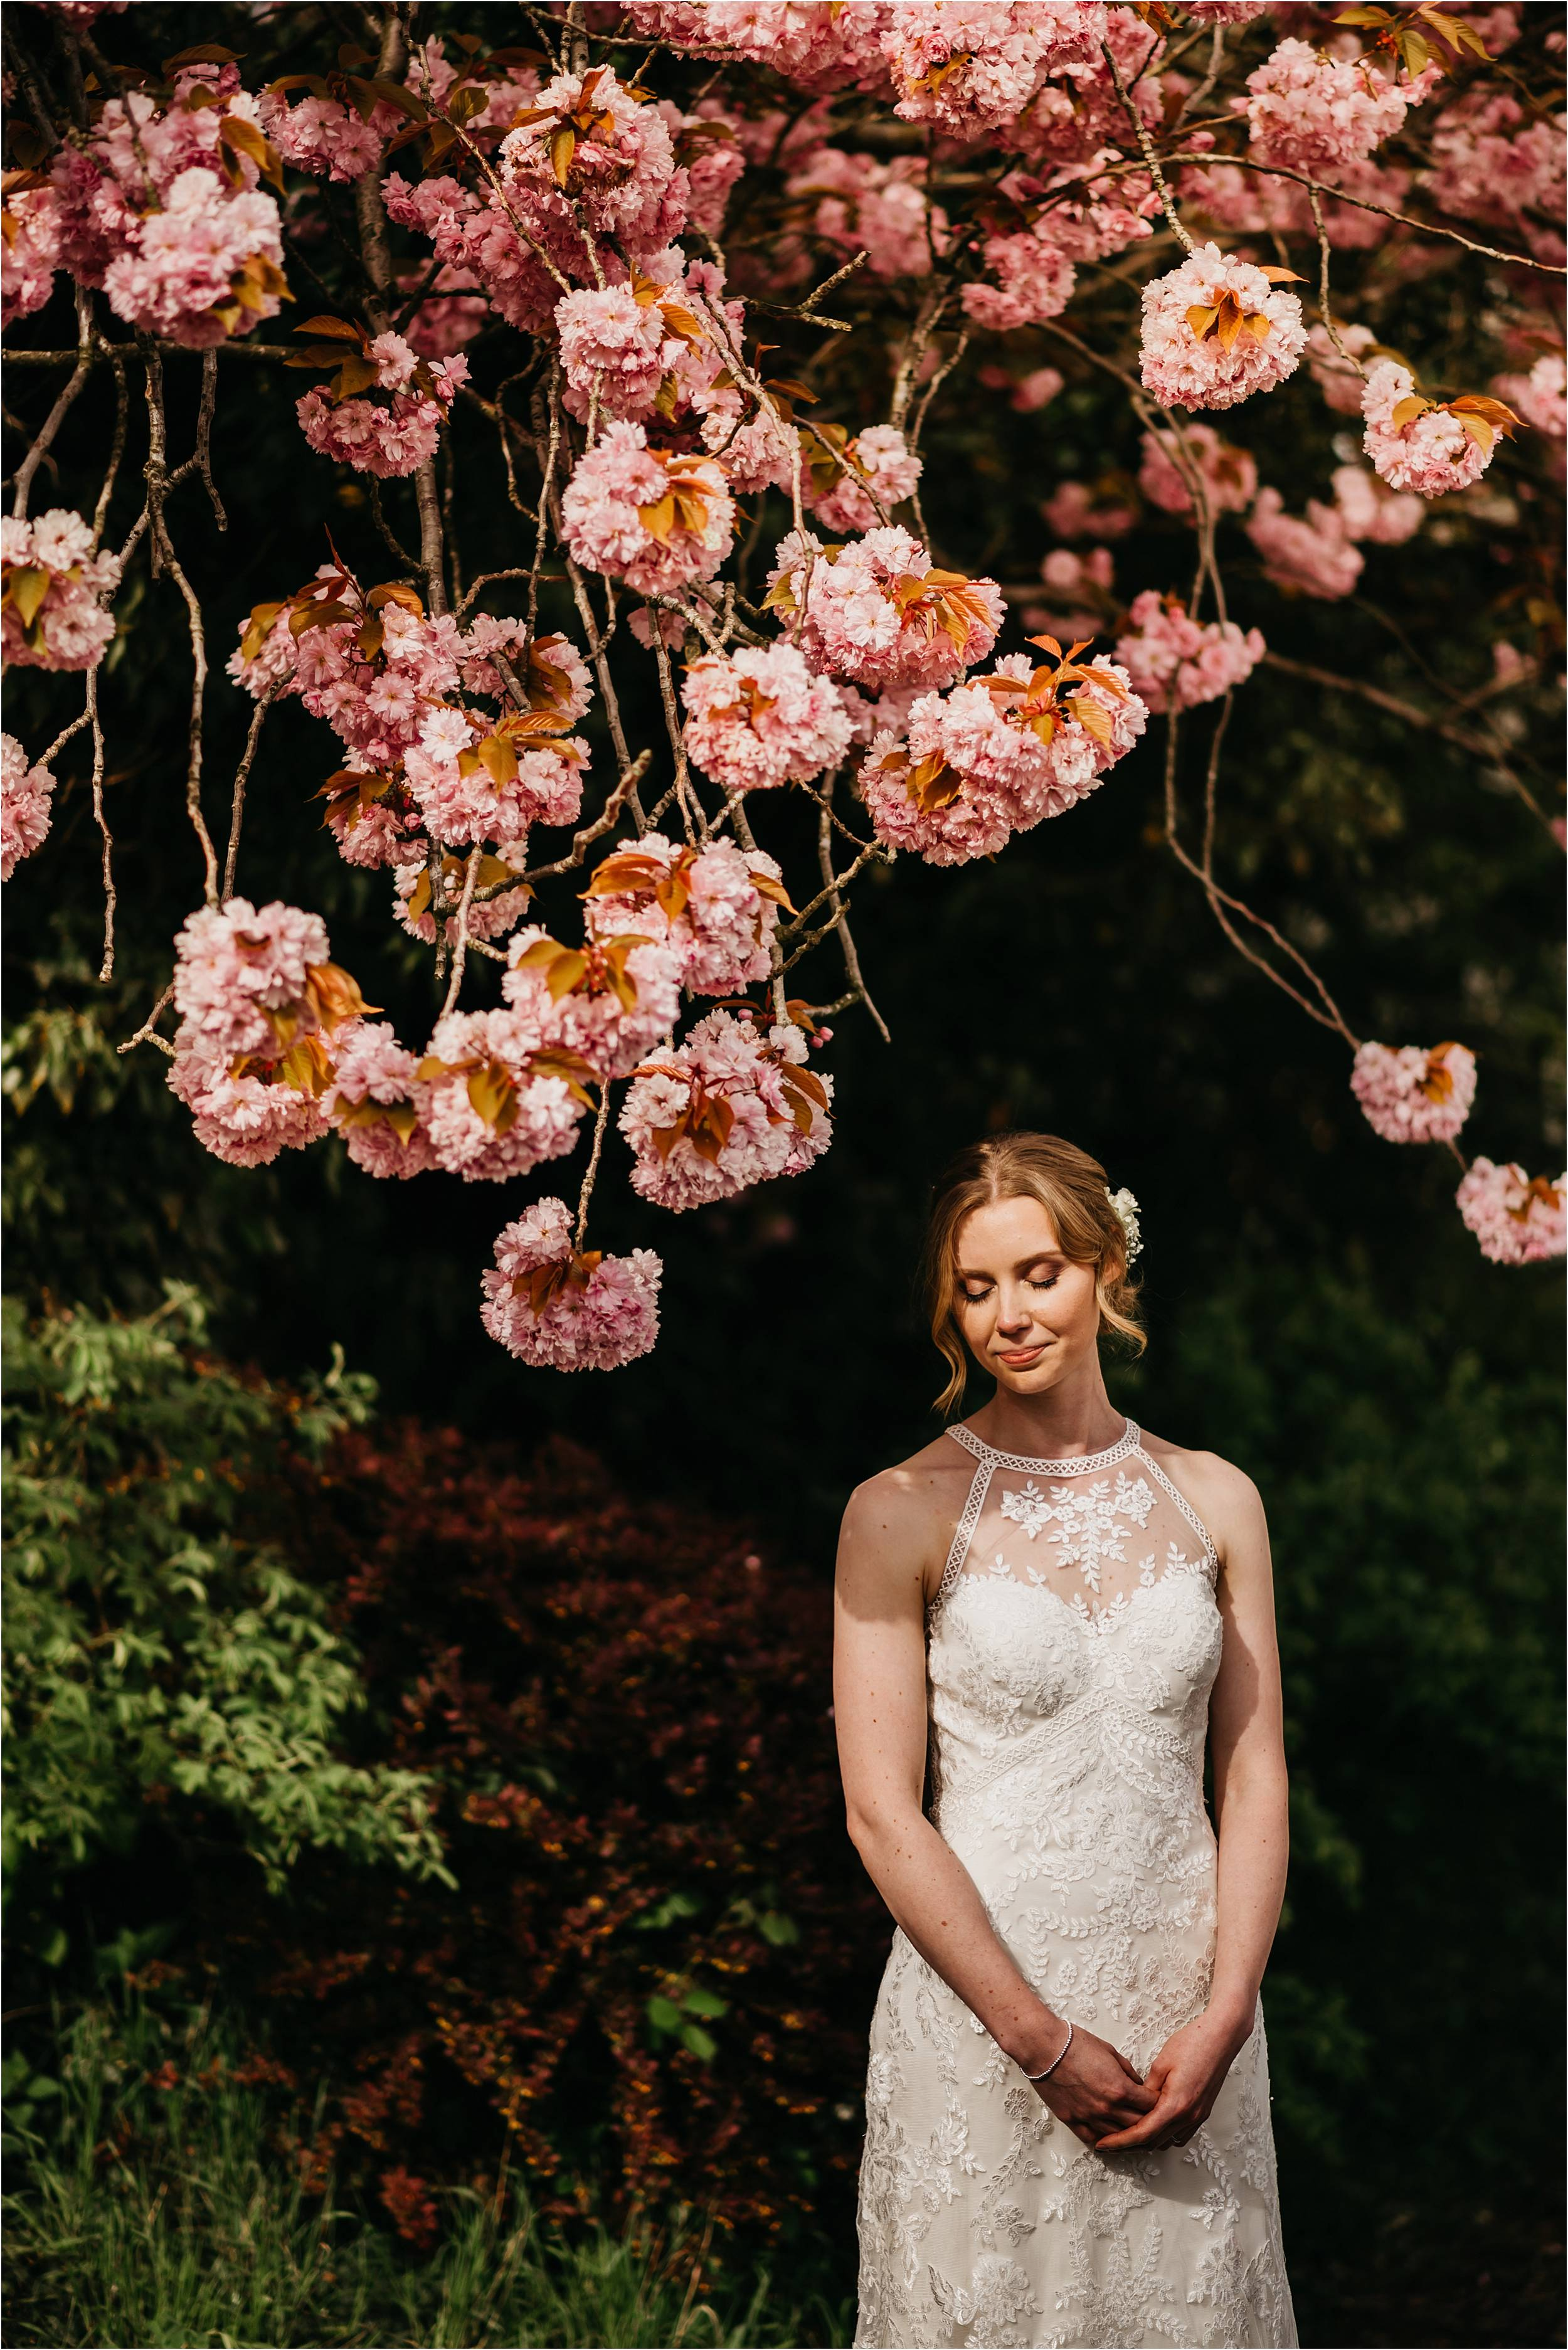 Kedleston Country House Wedding Photography_0073.jpg